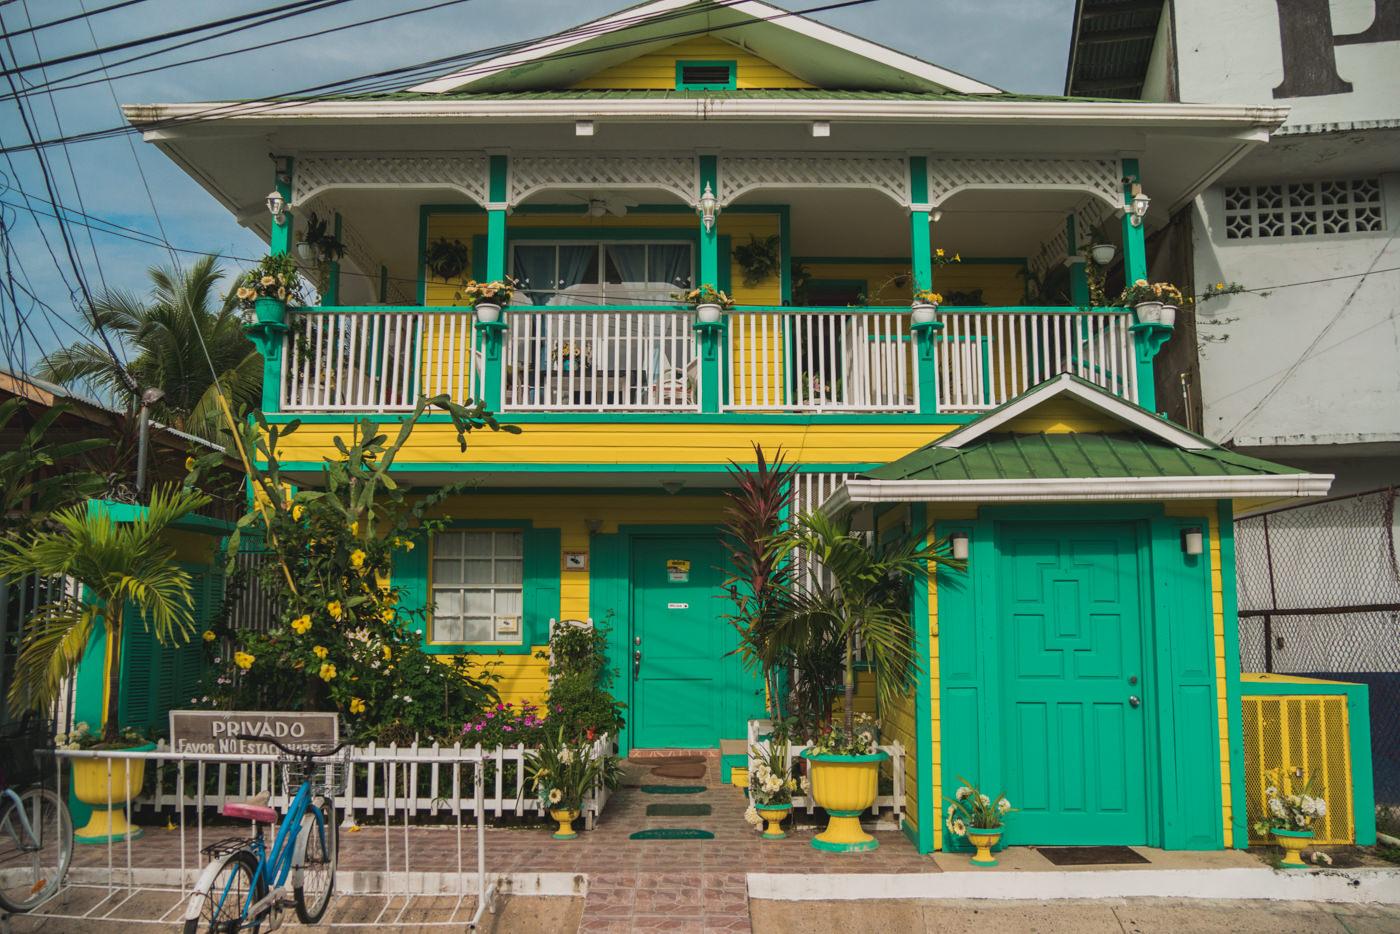 Haus auf der Isla Colon, Bocas del Toro